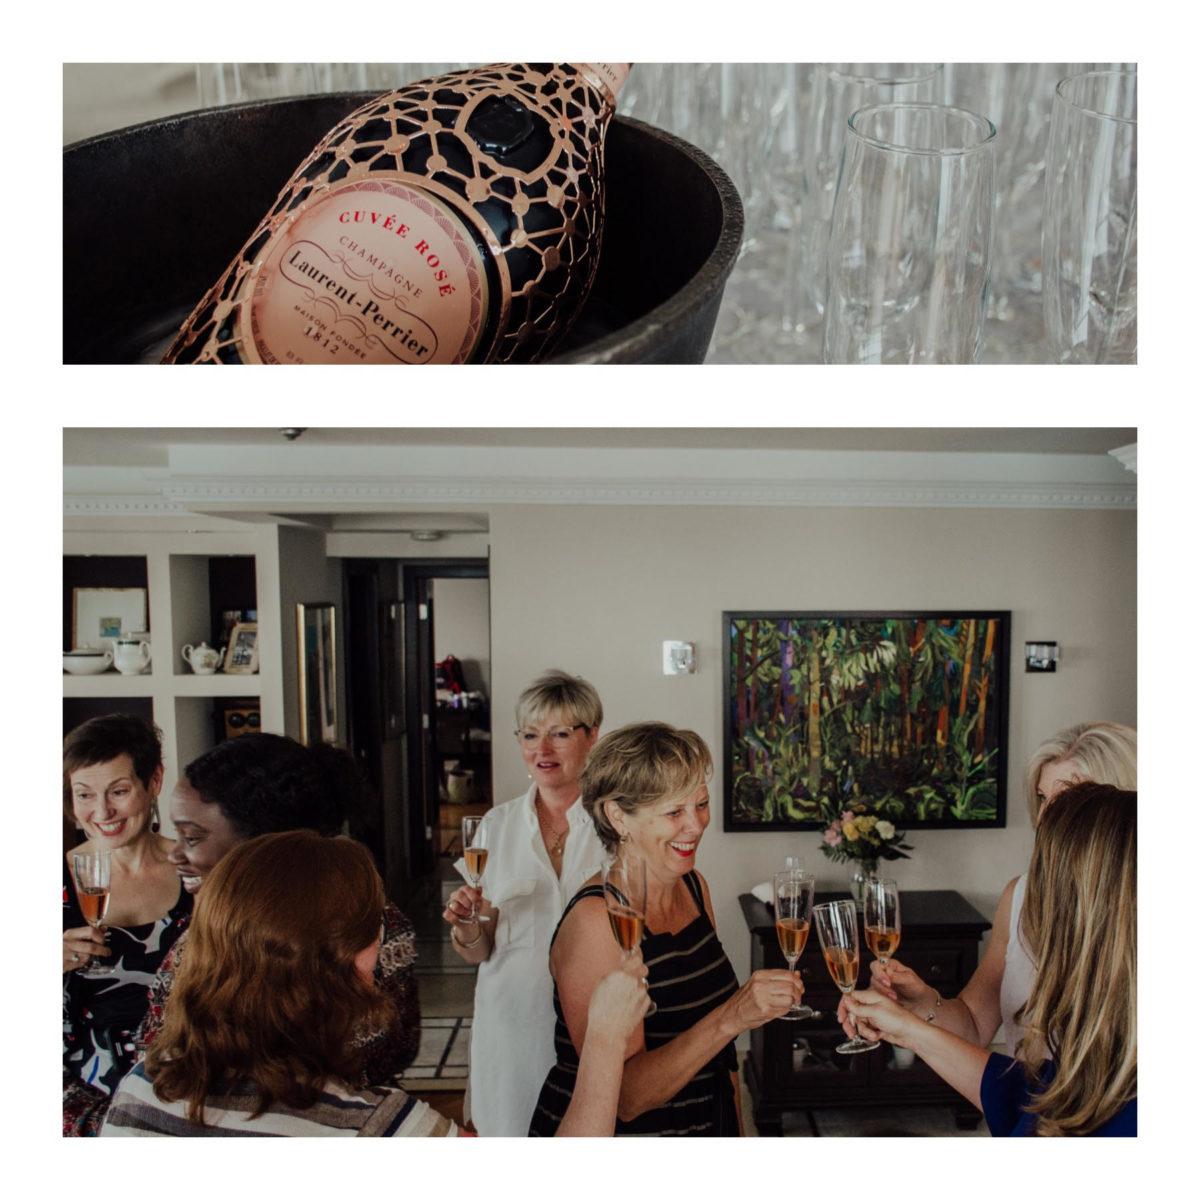 Les Dames d'Escoffier – Ontario Celebrate with Laurent-Perrier Cuvee Rose Constellation